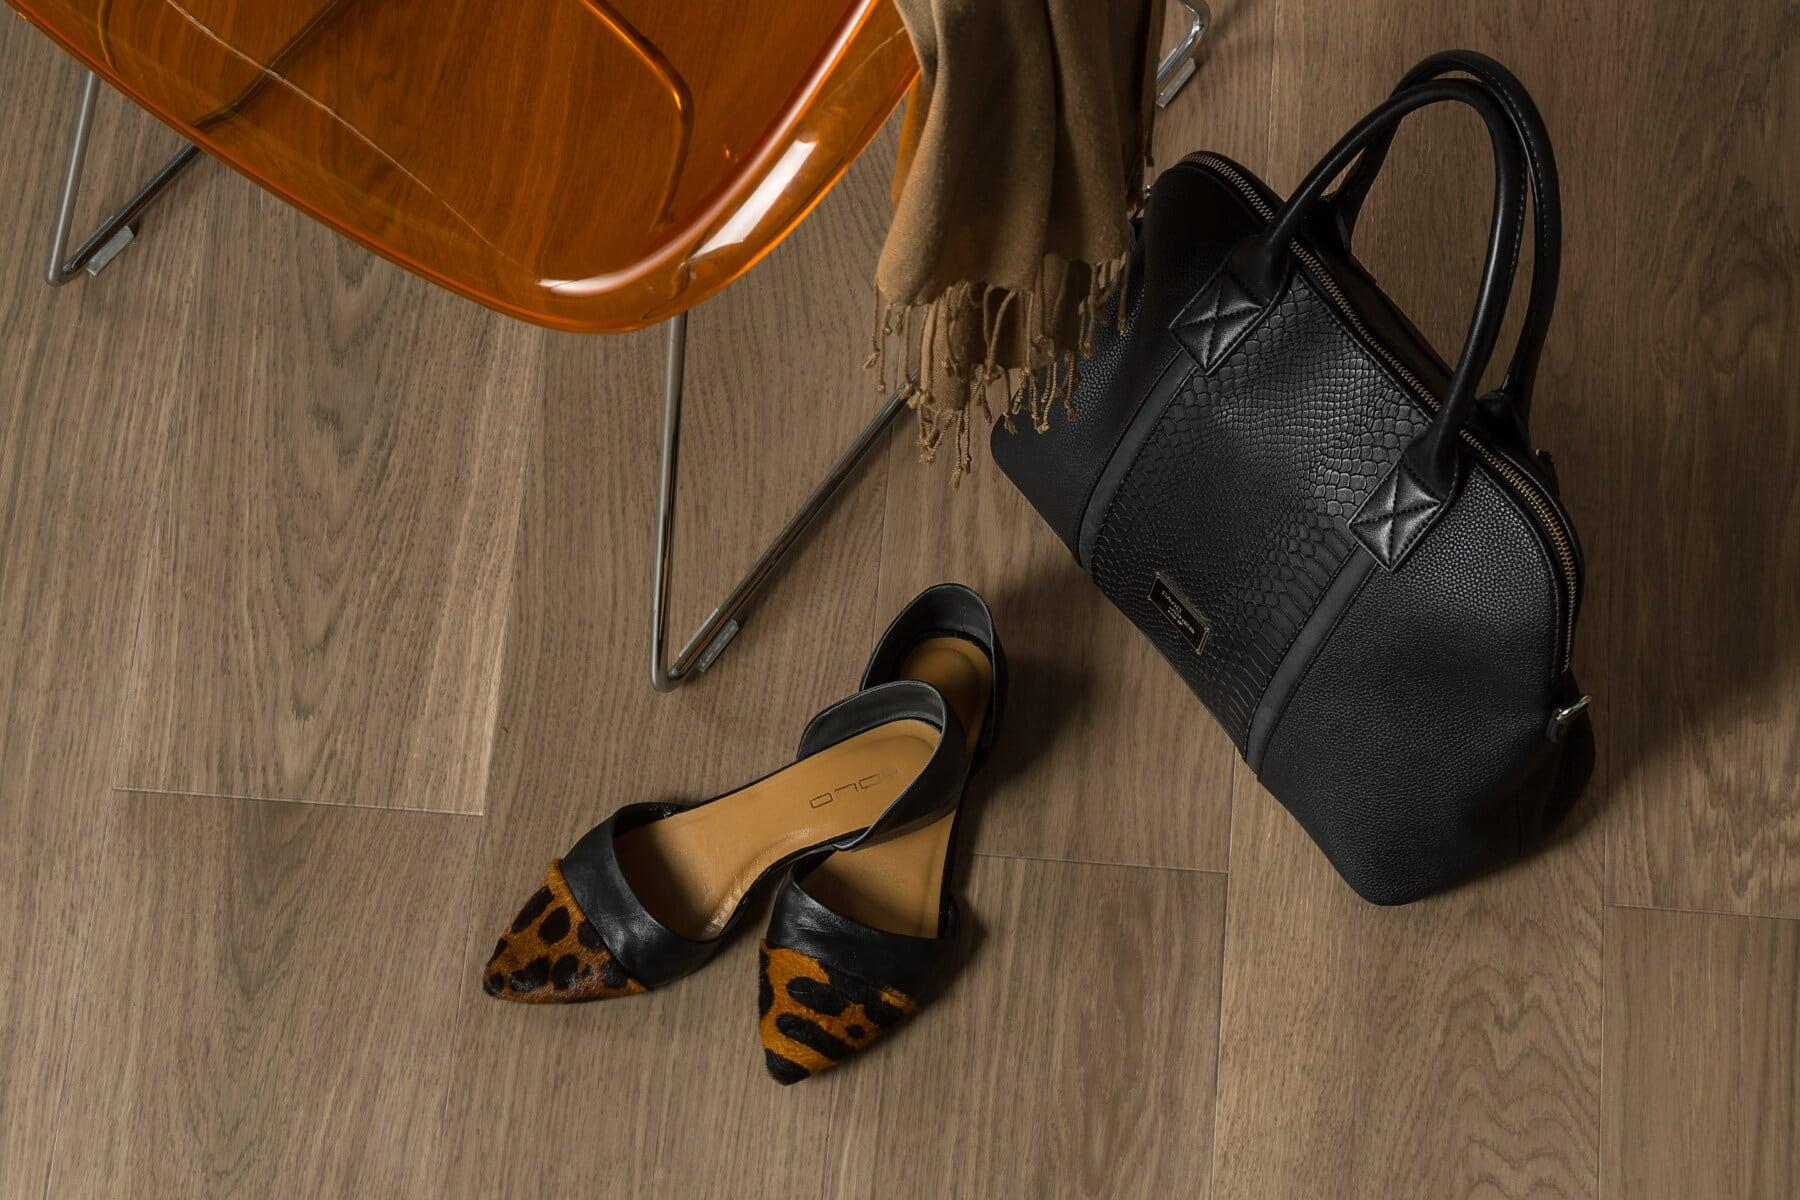 Stil, Handtasche, Schuhe, feminine, Sandale, Design, Stock, Stuhl, Schuhe, Verkleidung